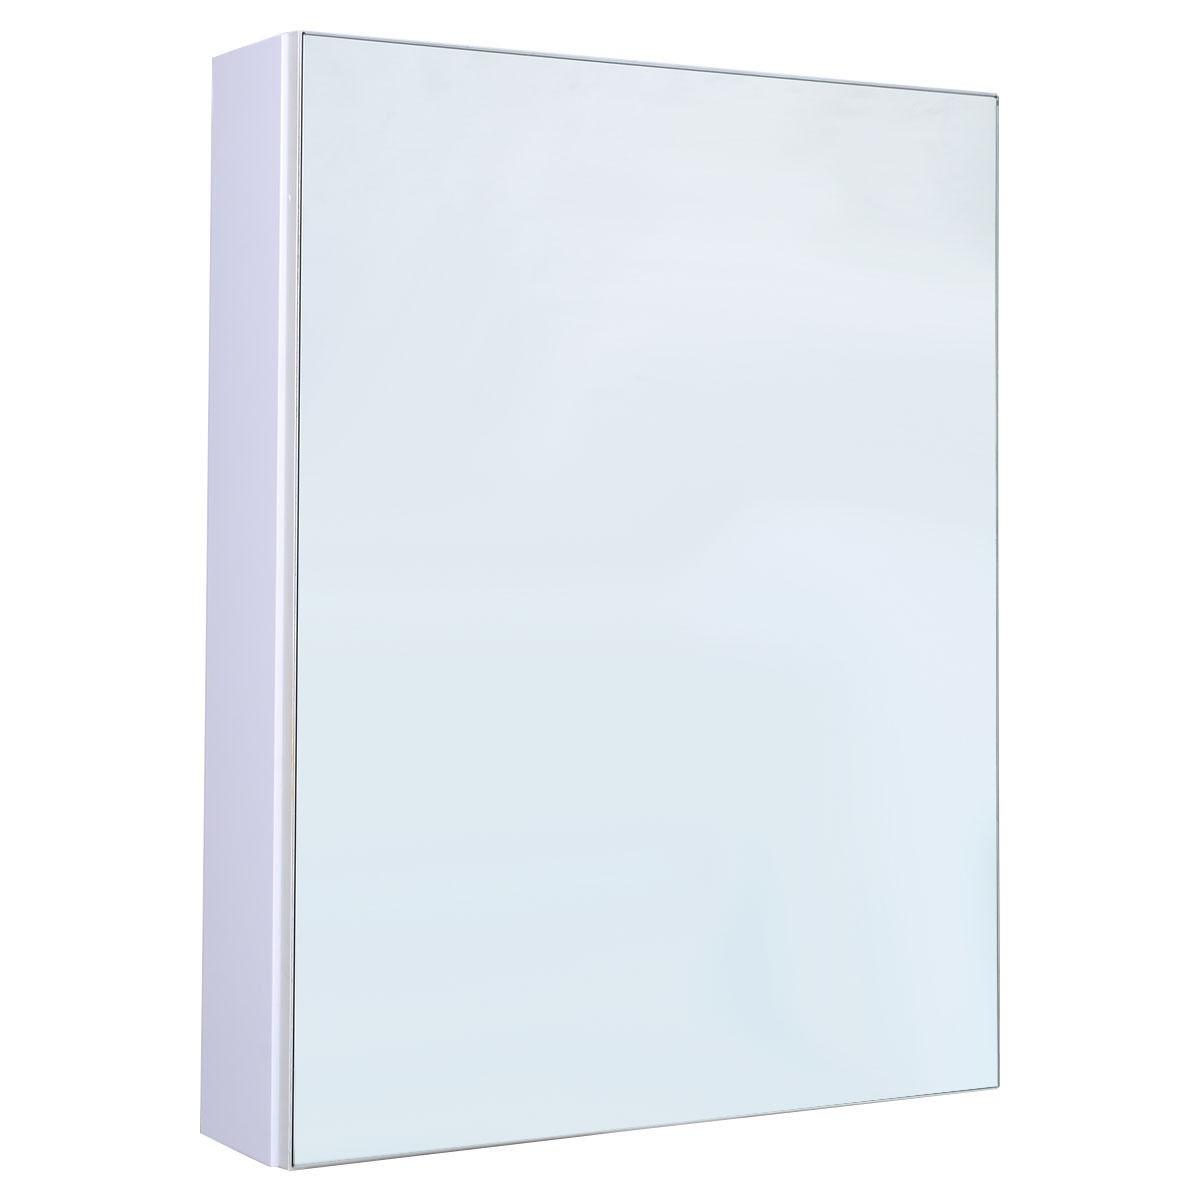 details about 3 mirror door 36 20 wide wall mount mirrored bathro